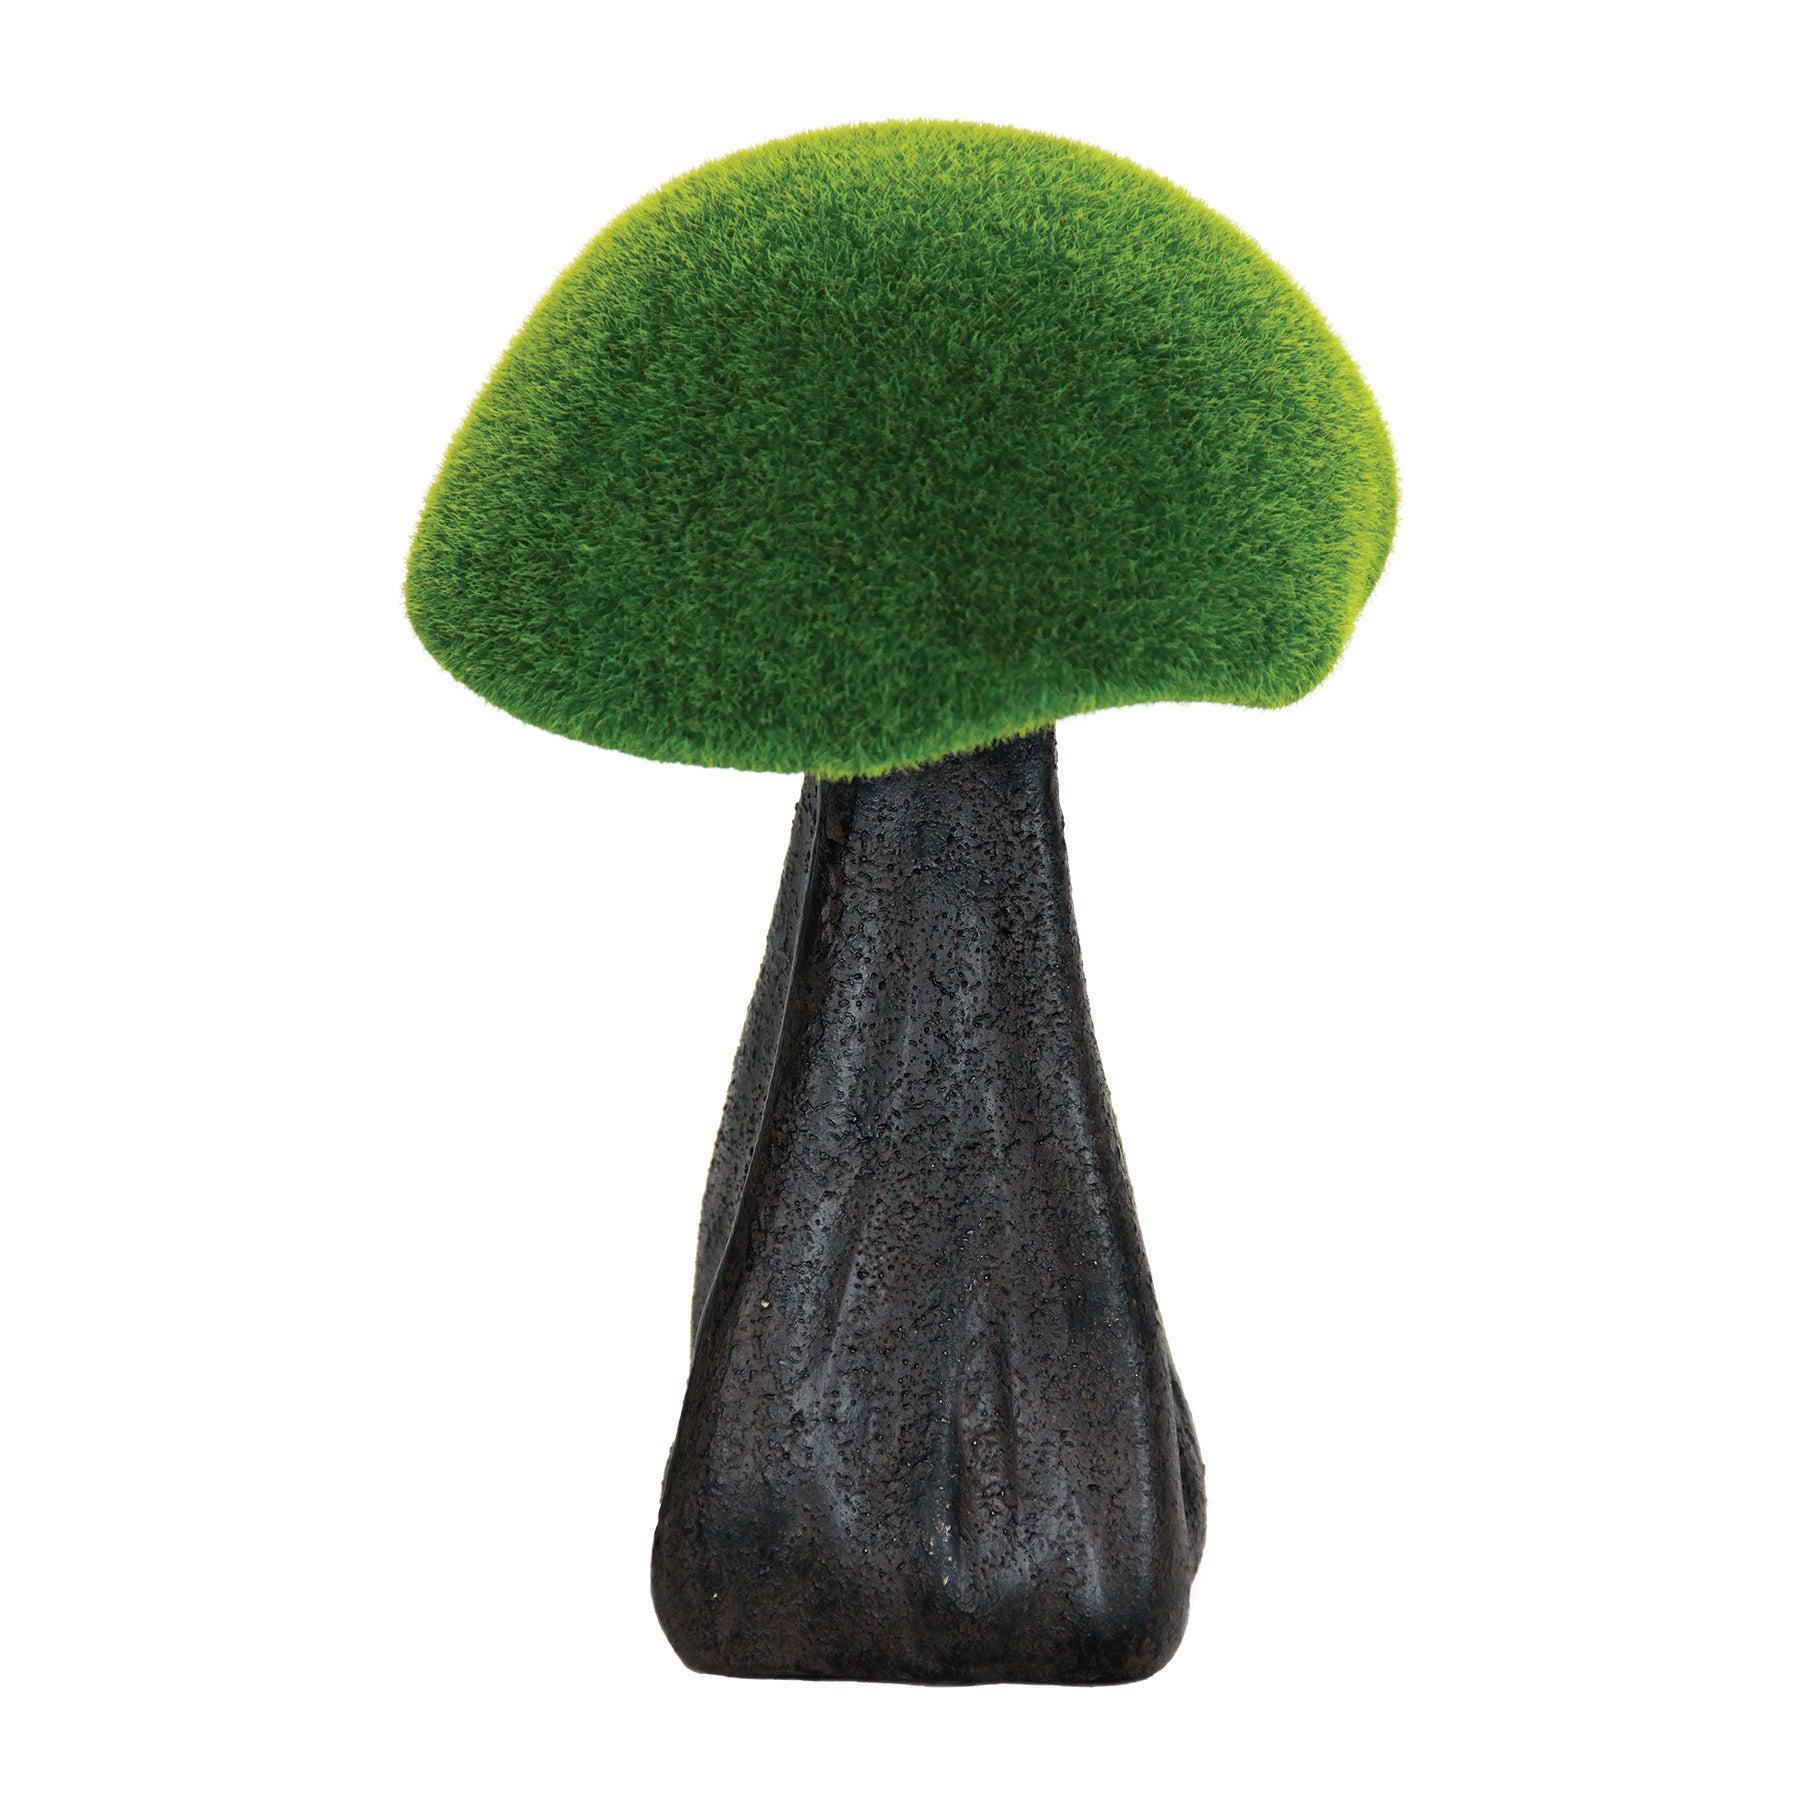 Sensational Exhart 10 Inch Moss Coated Mushroom Garden Statue Pabps2019 Chair Design Images Pabps2019Com